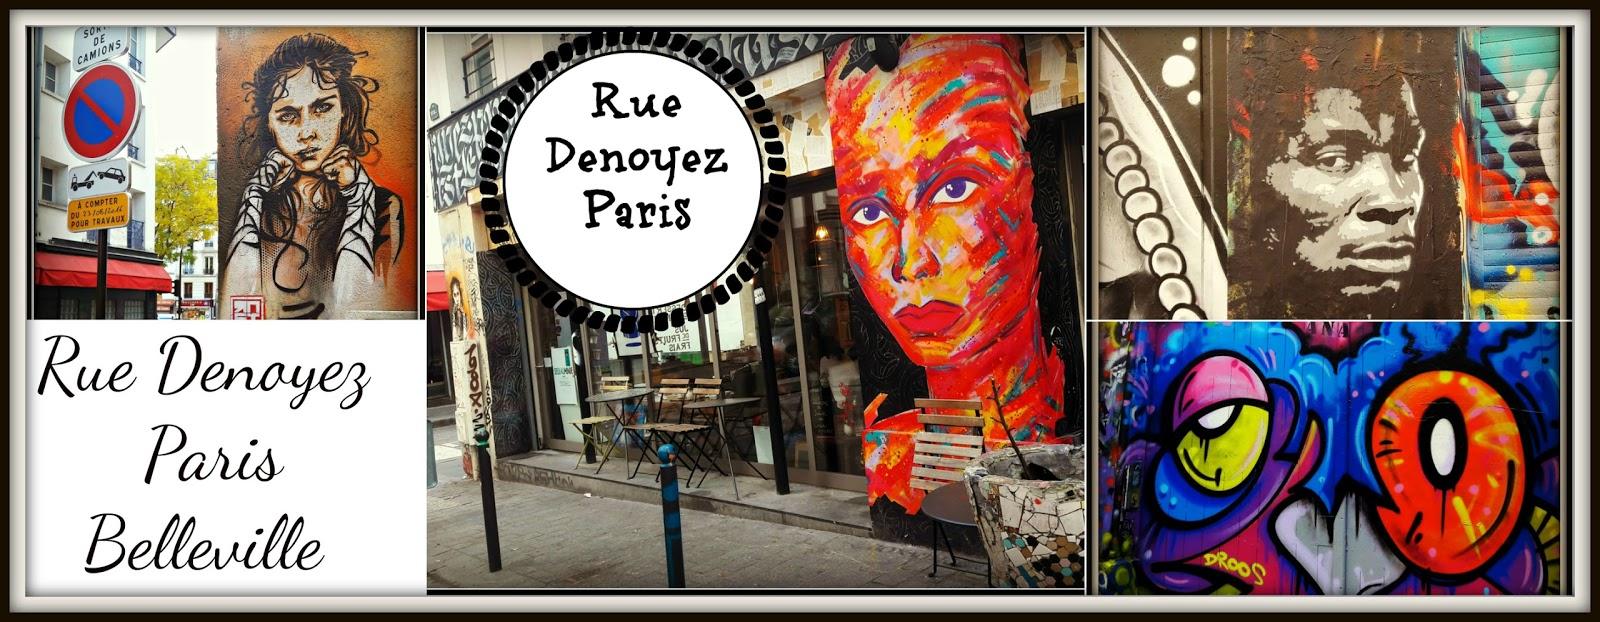 Bellevile Paris - najbardziej odjechana ulica